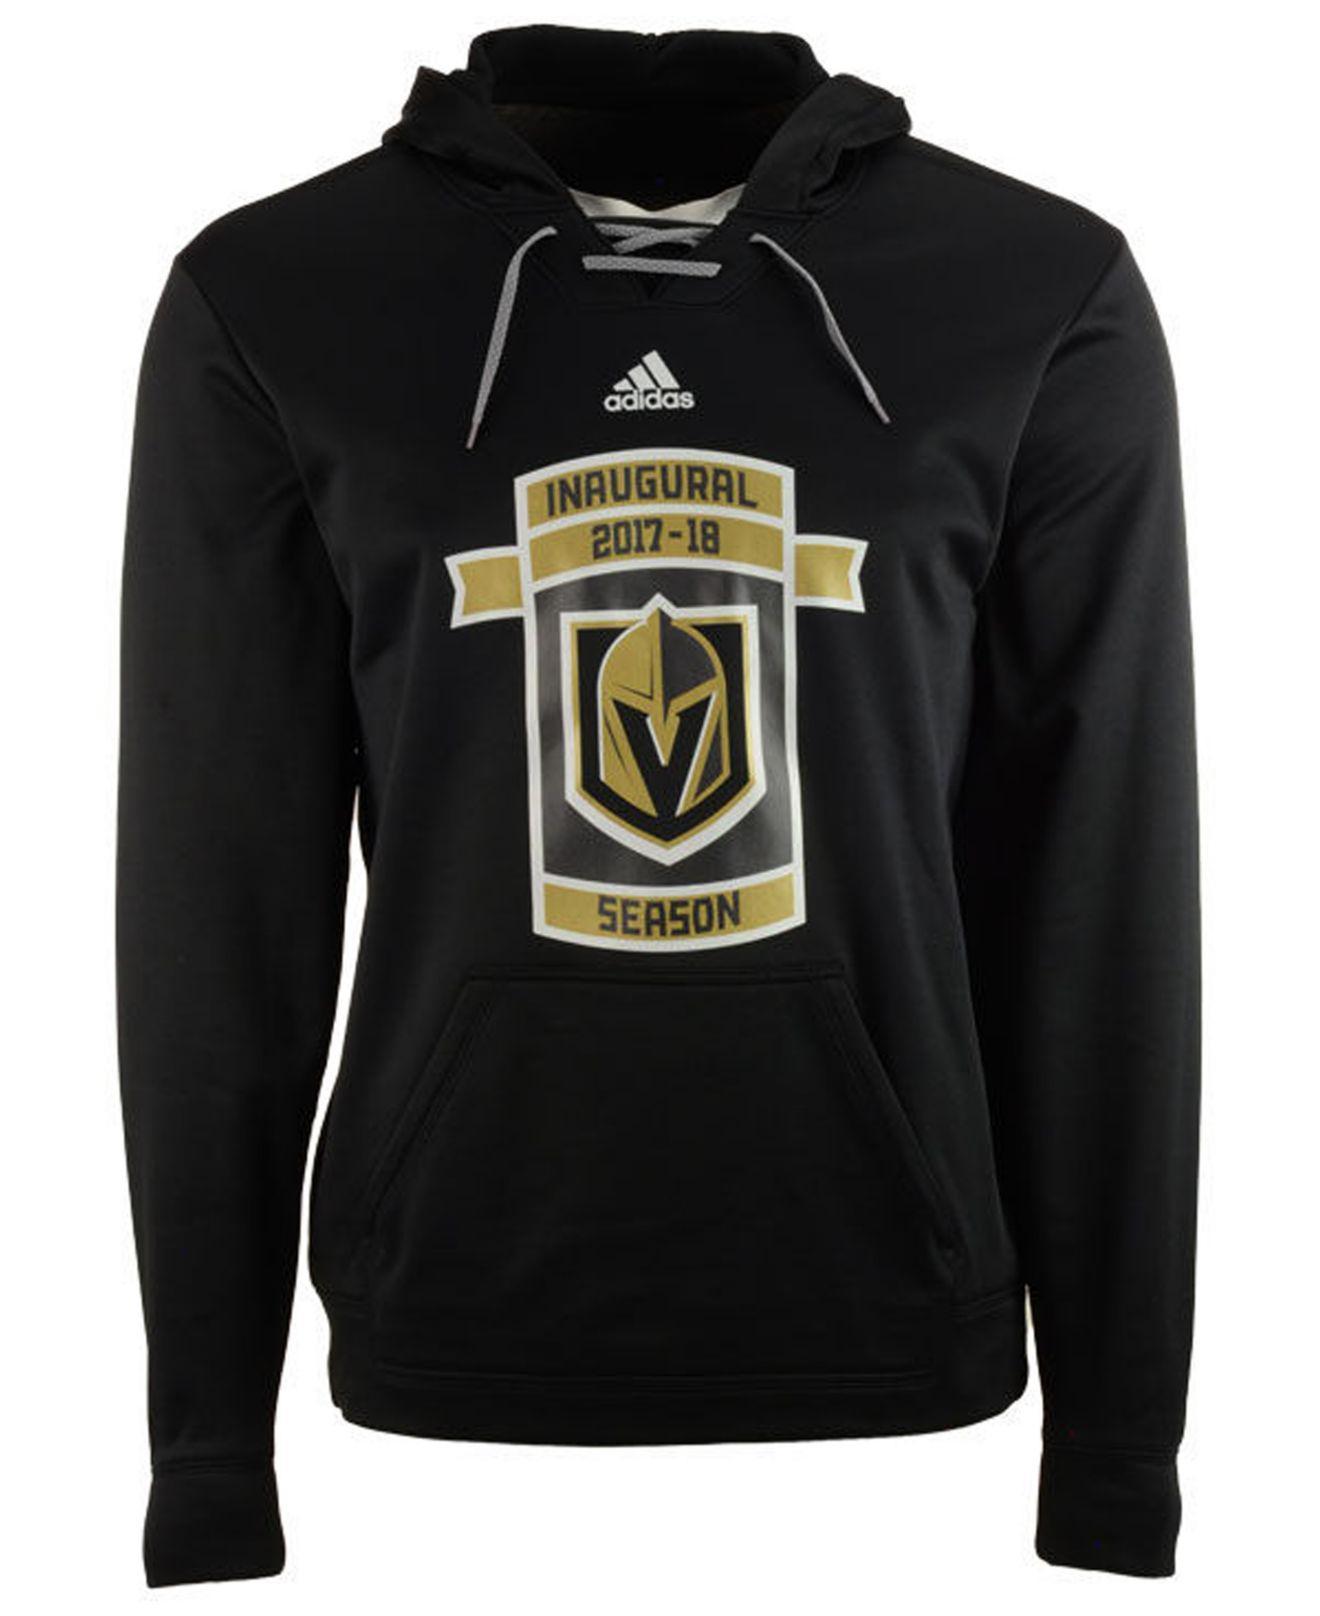 new concept 4c8de 26484 Adidas Black Vegas Golden Knights Inaugural Season Performance Fleece  Hoodie for men